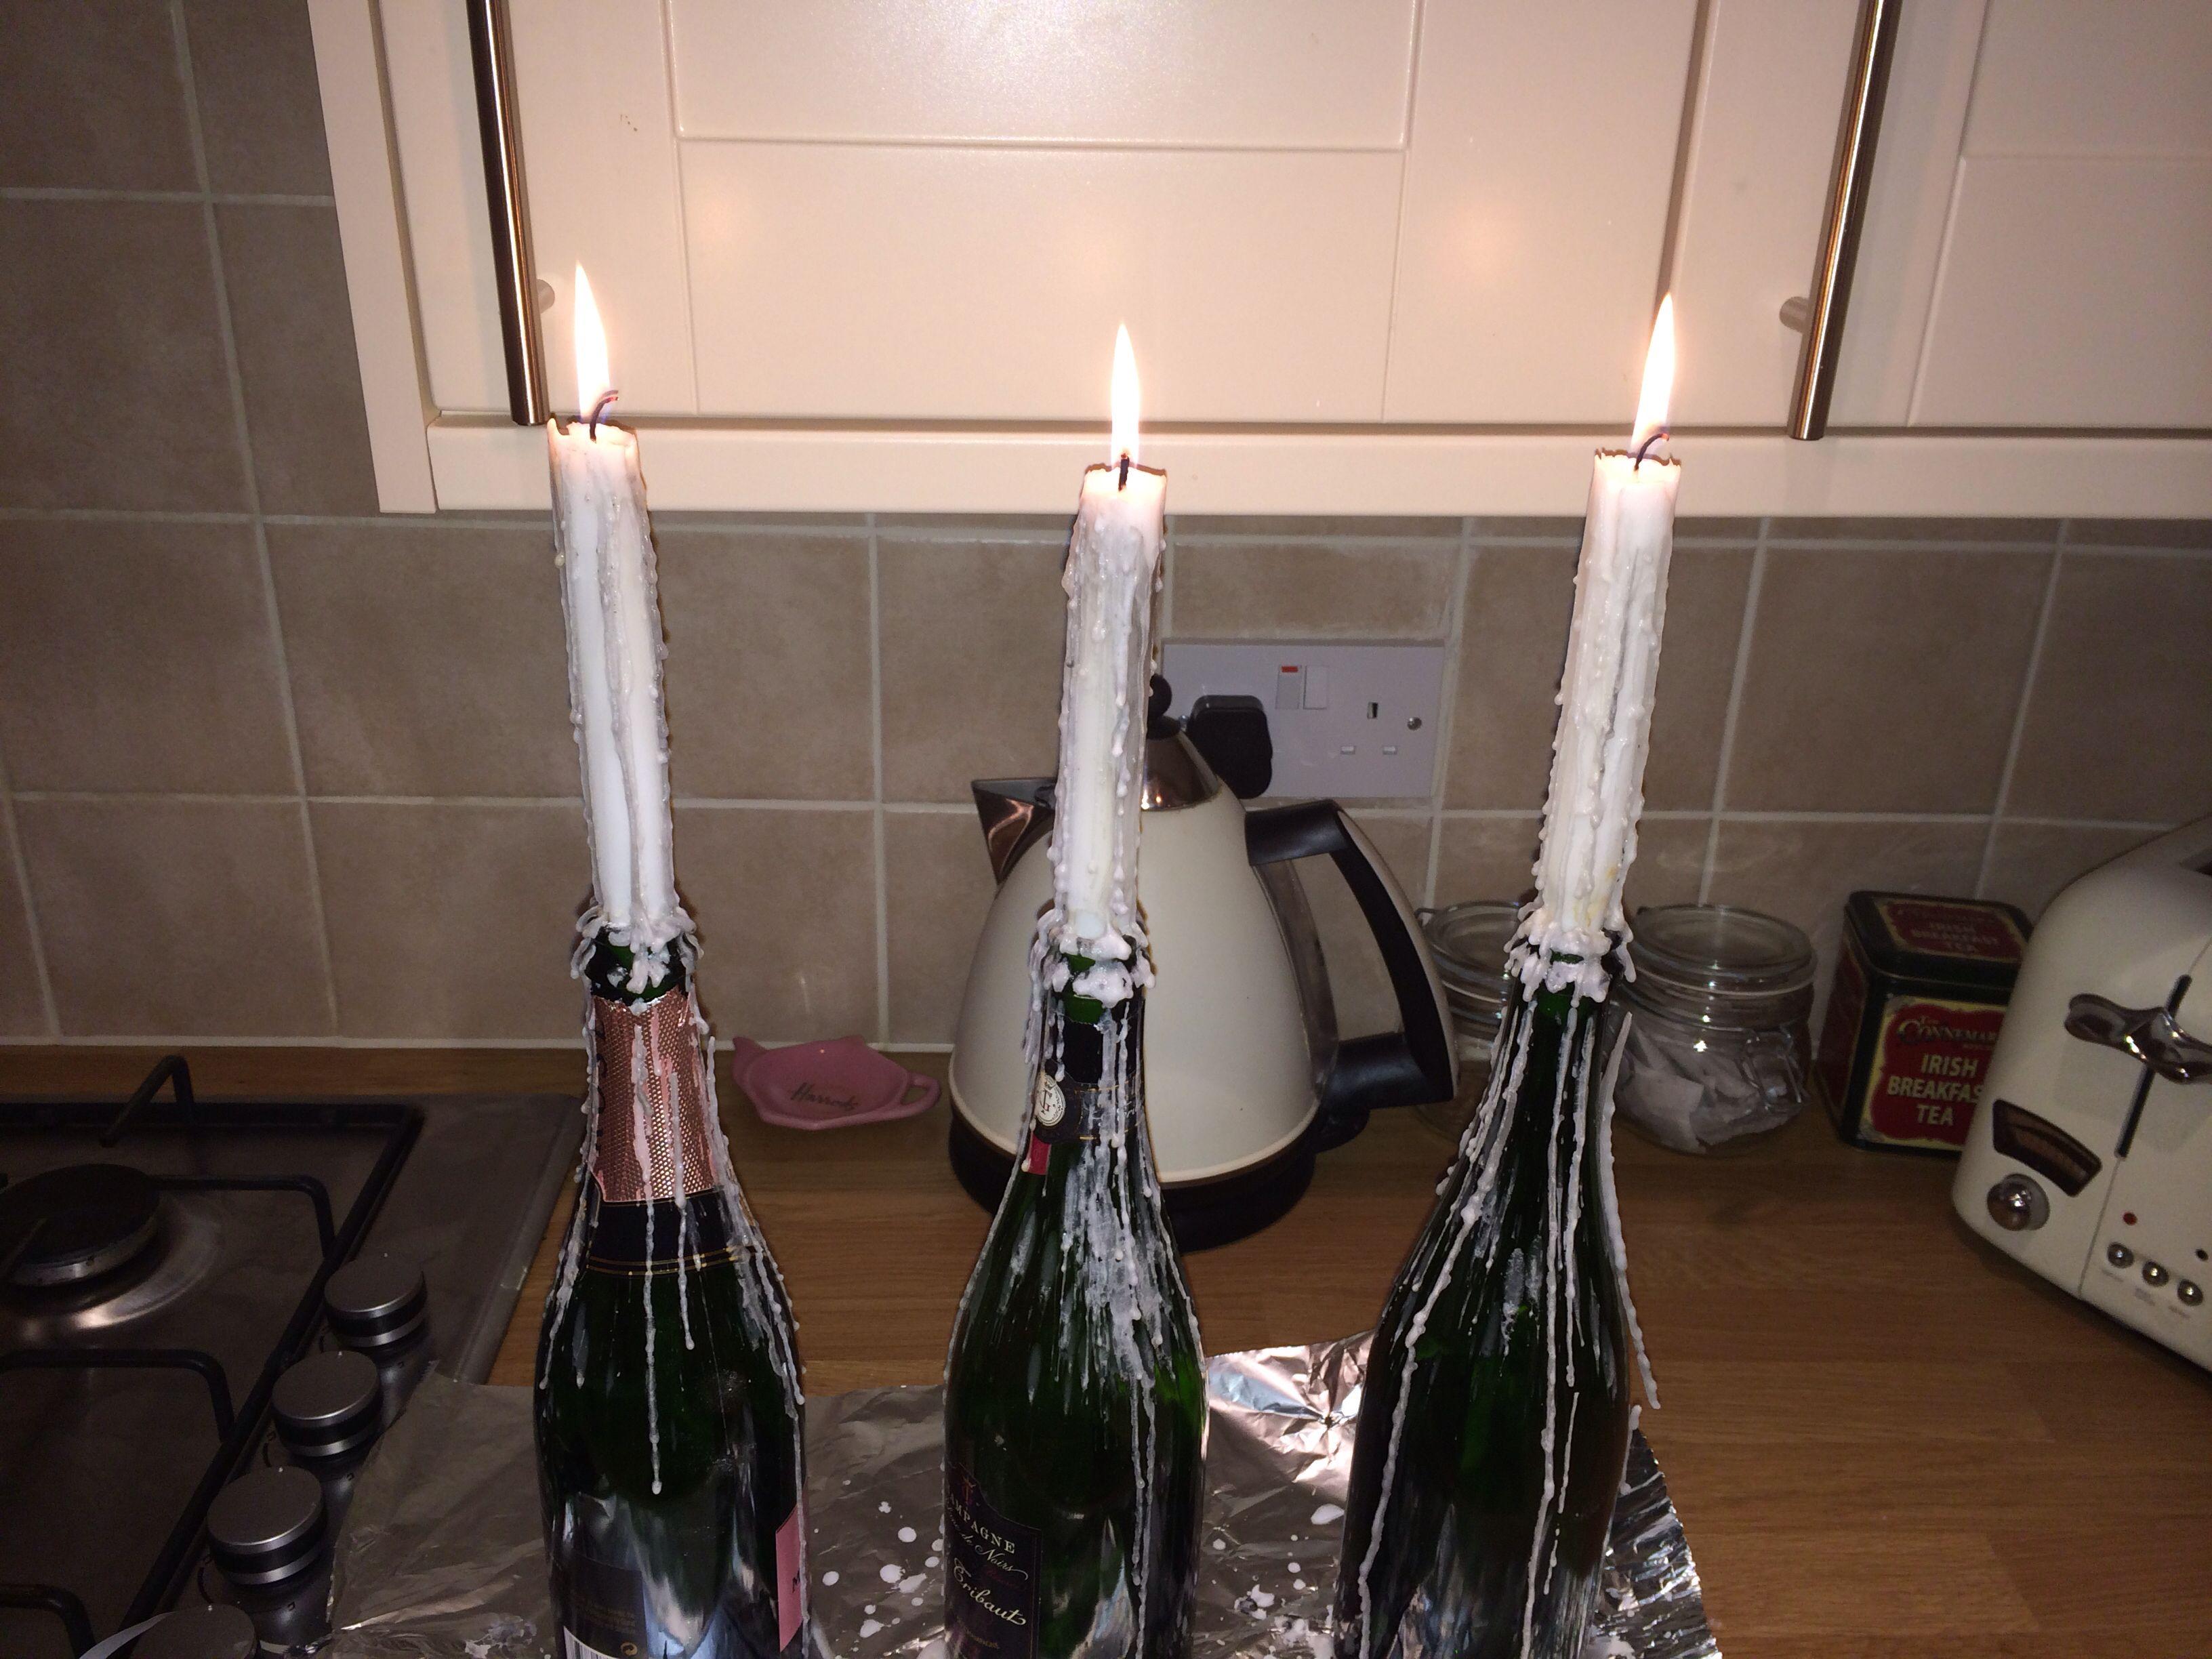 Champaign bottle candles